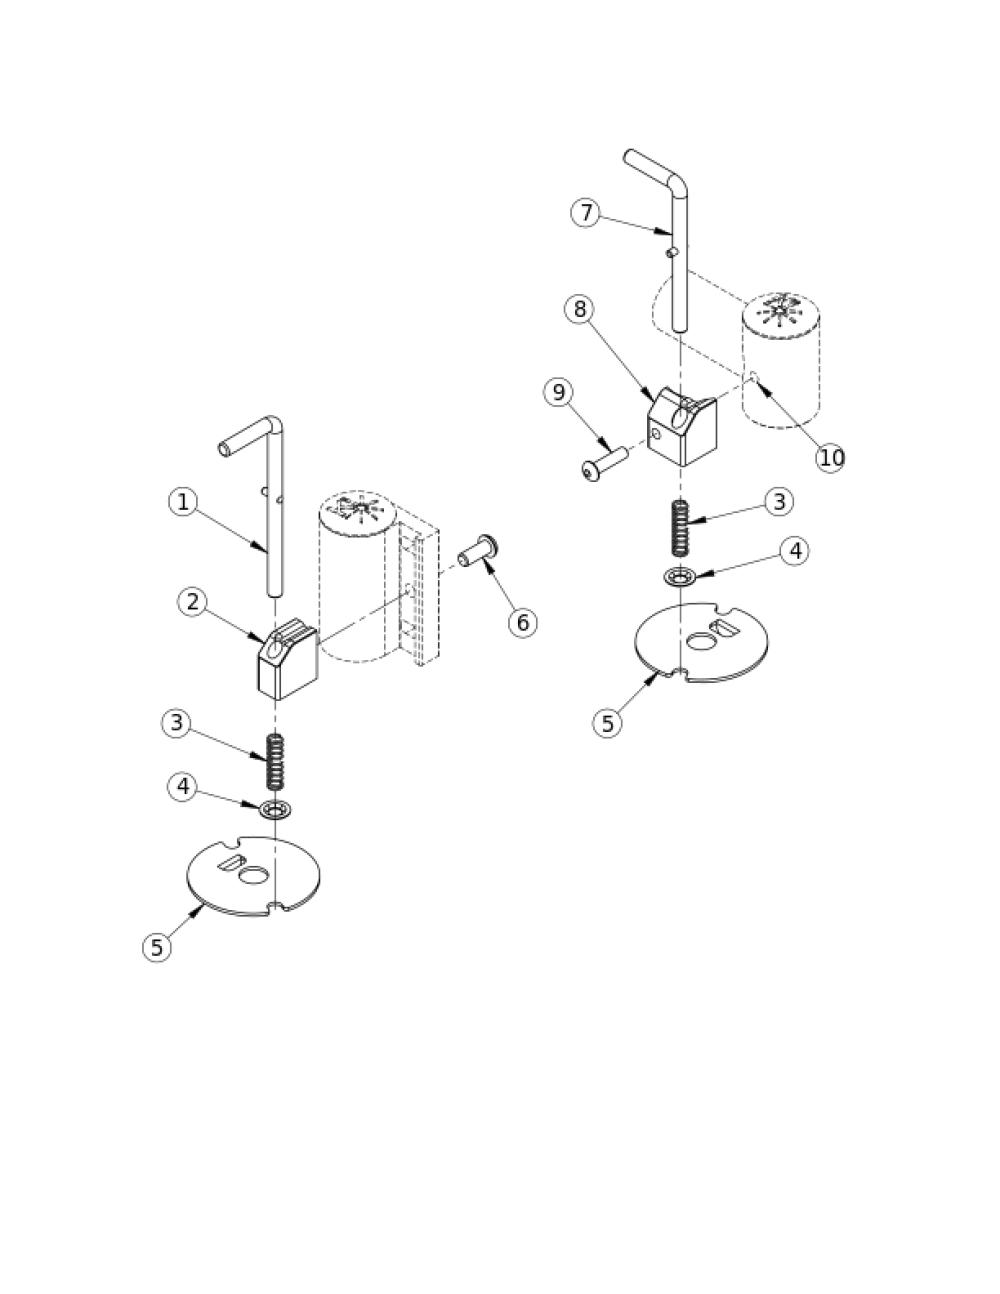 (discontinued) Caster Pin Locks parts diagram